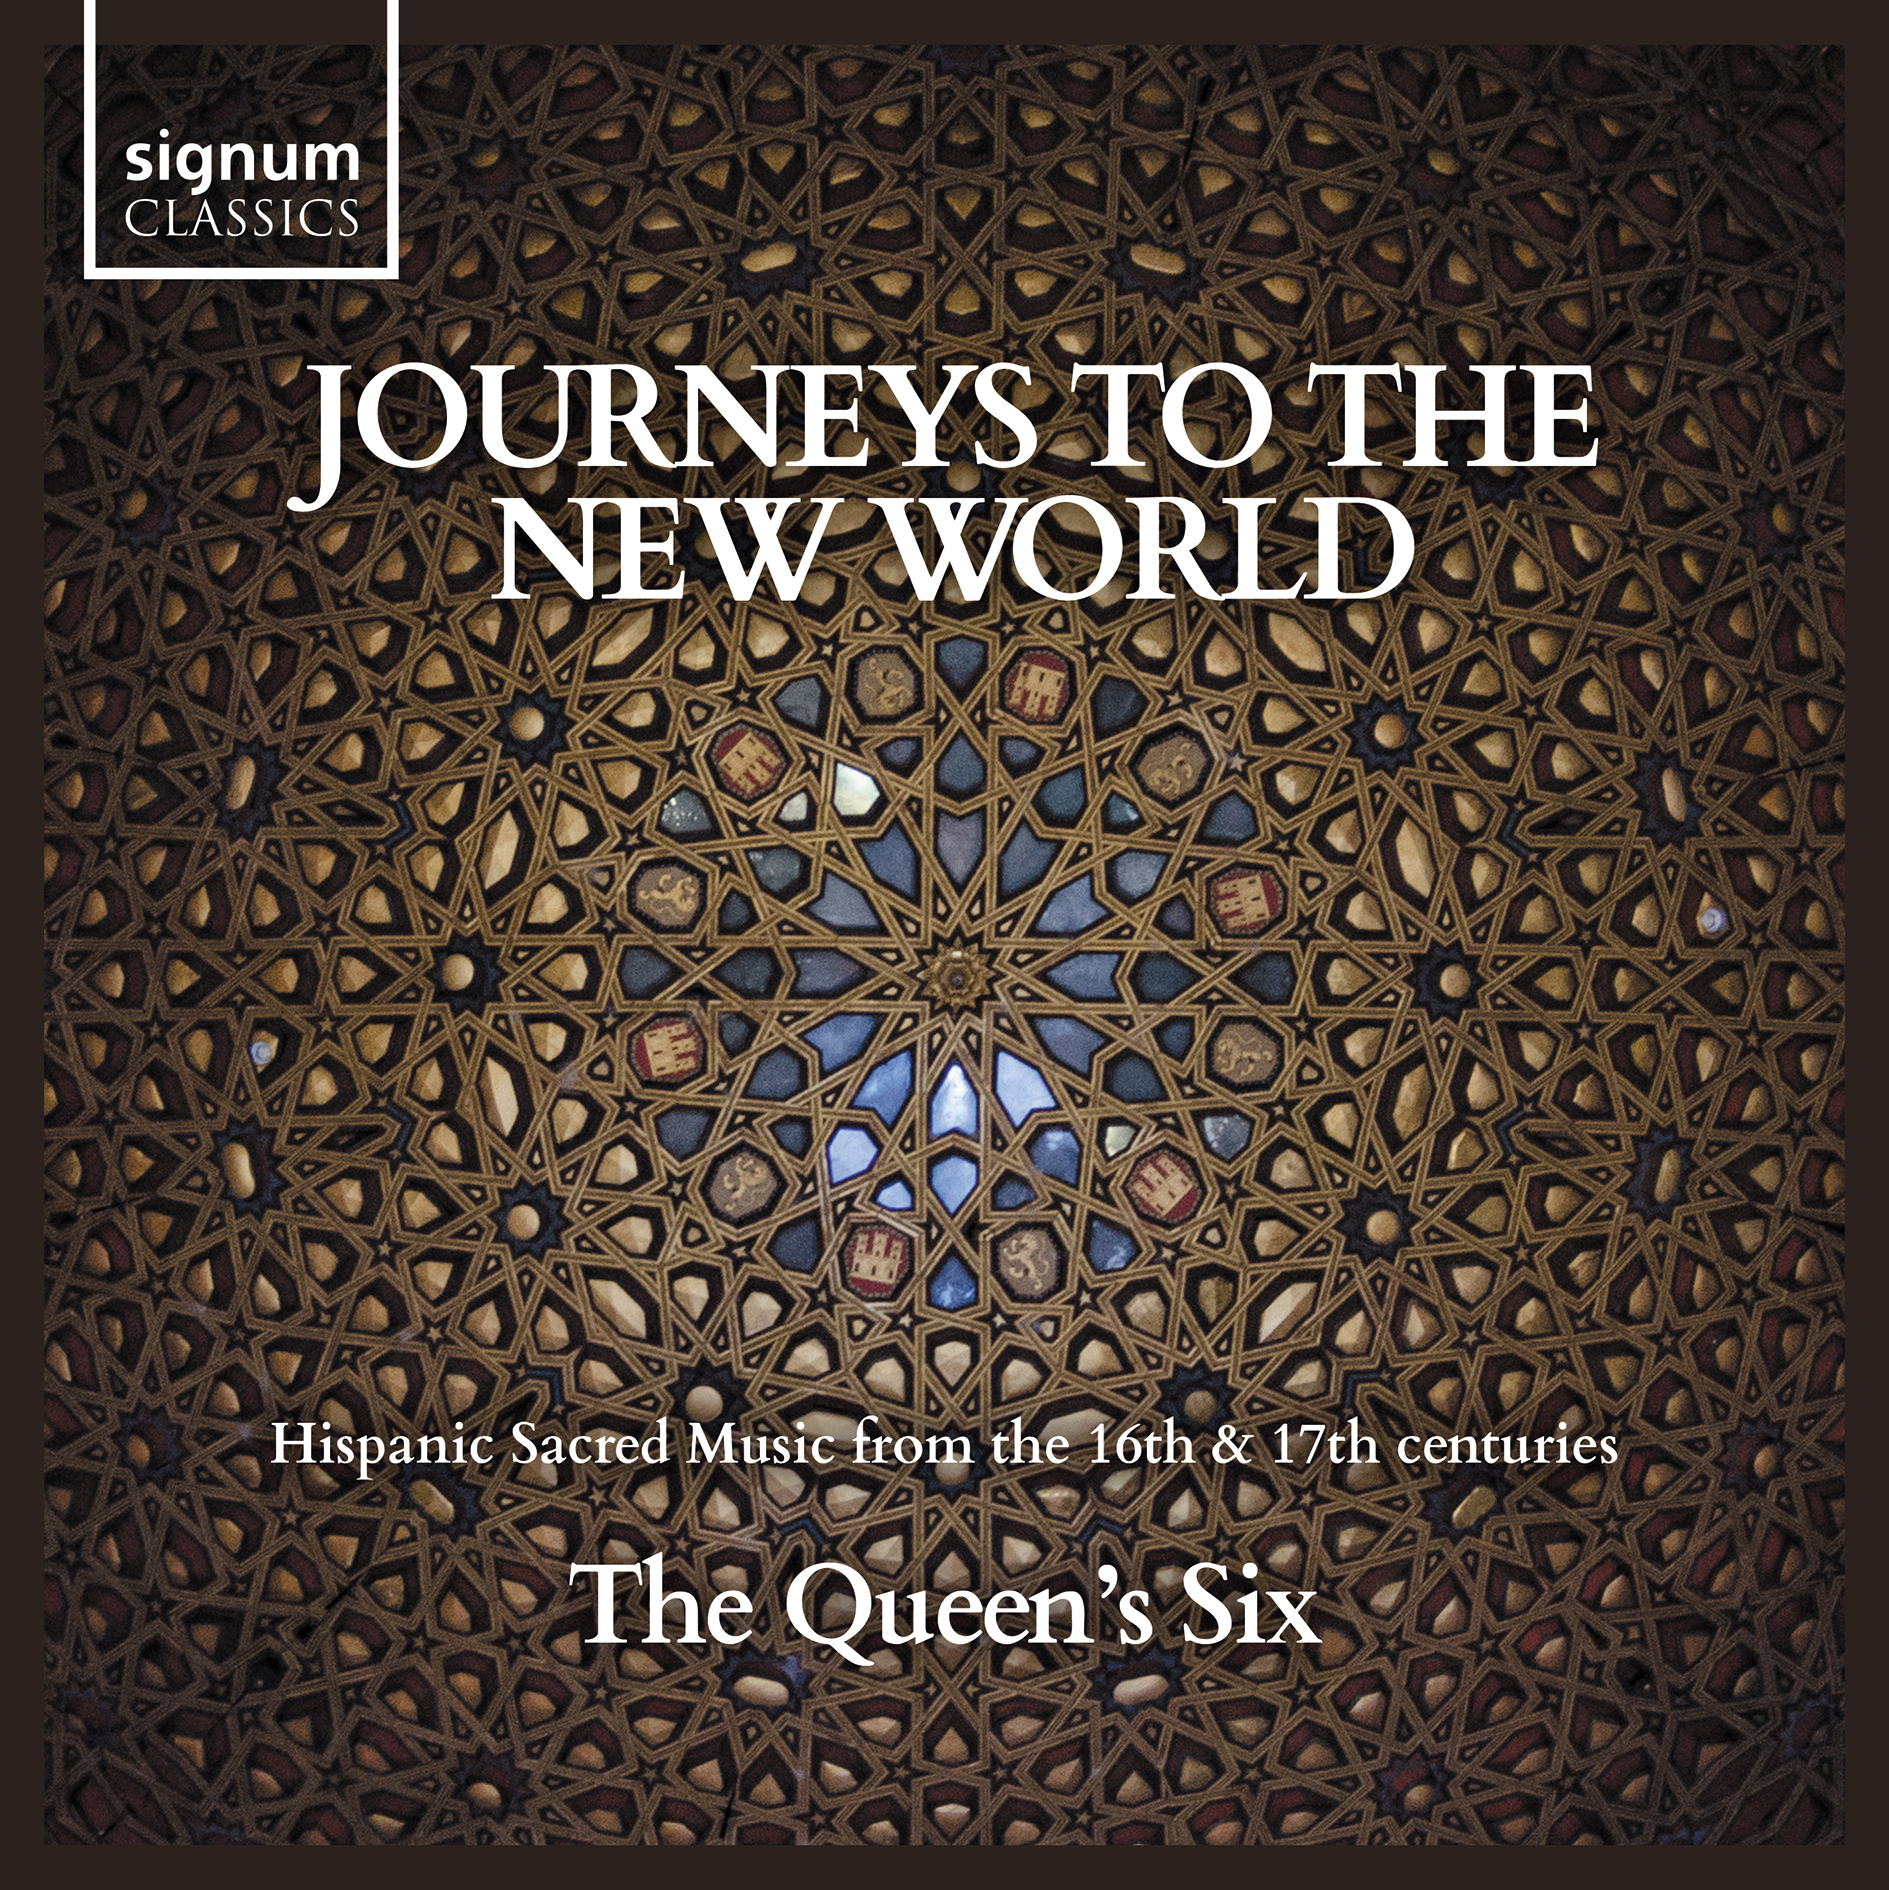 The Queens Six Journeys tot the New World